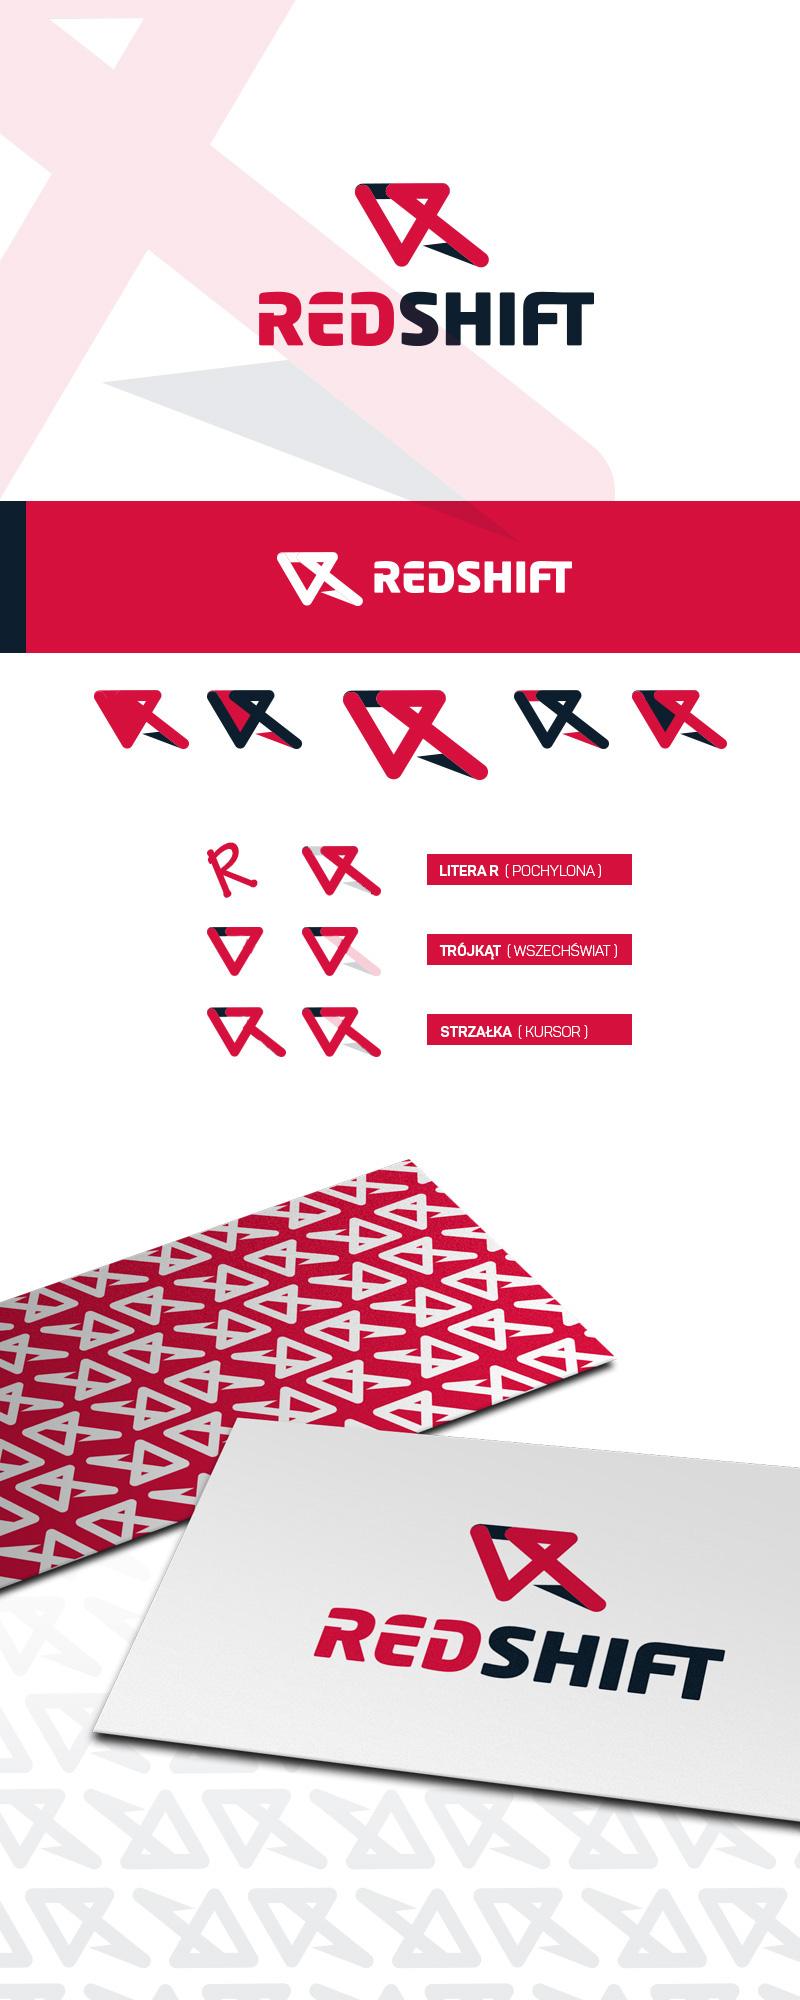 redshift-projekt-logo